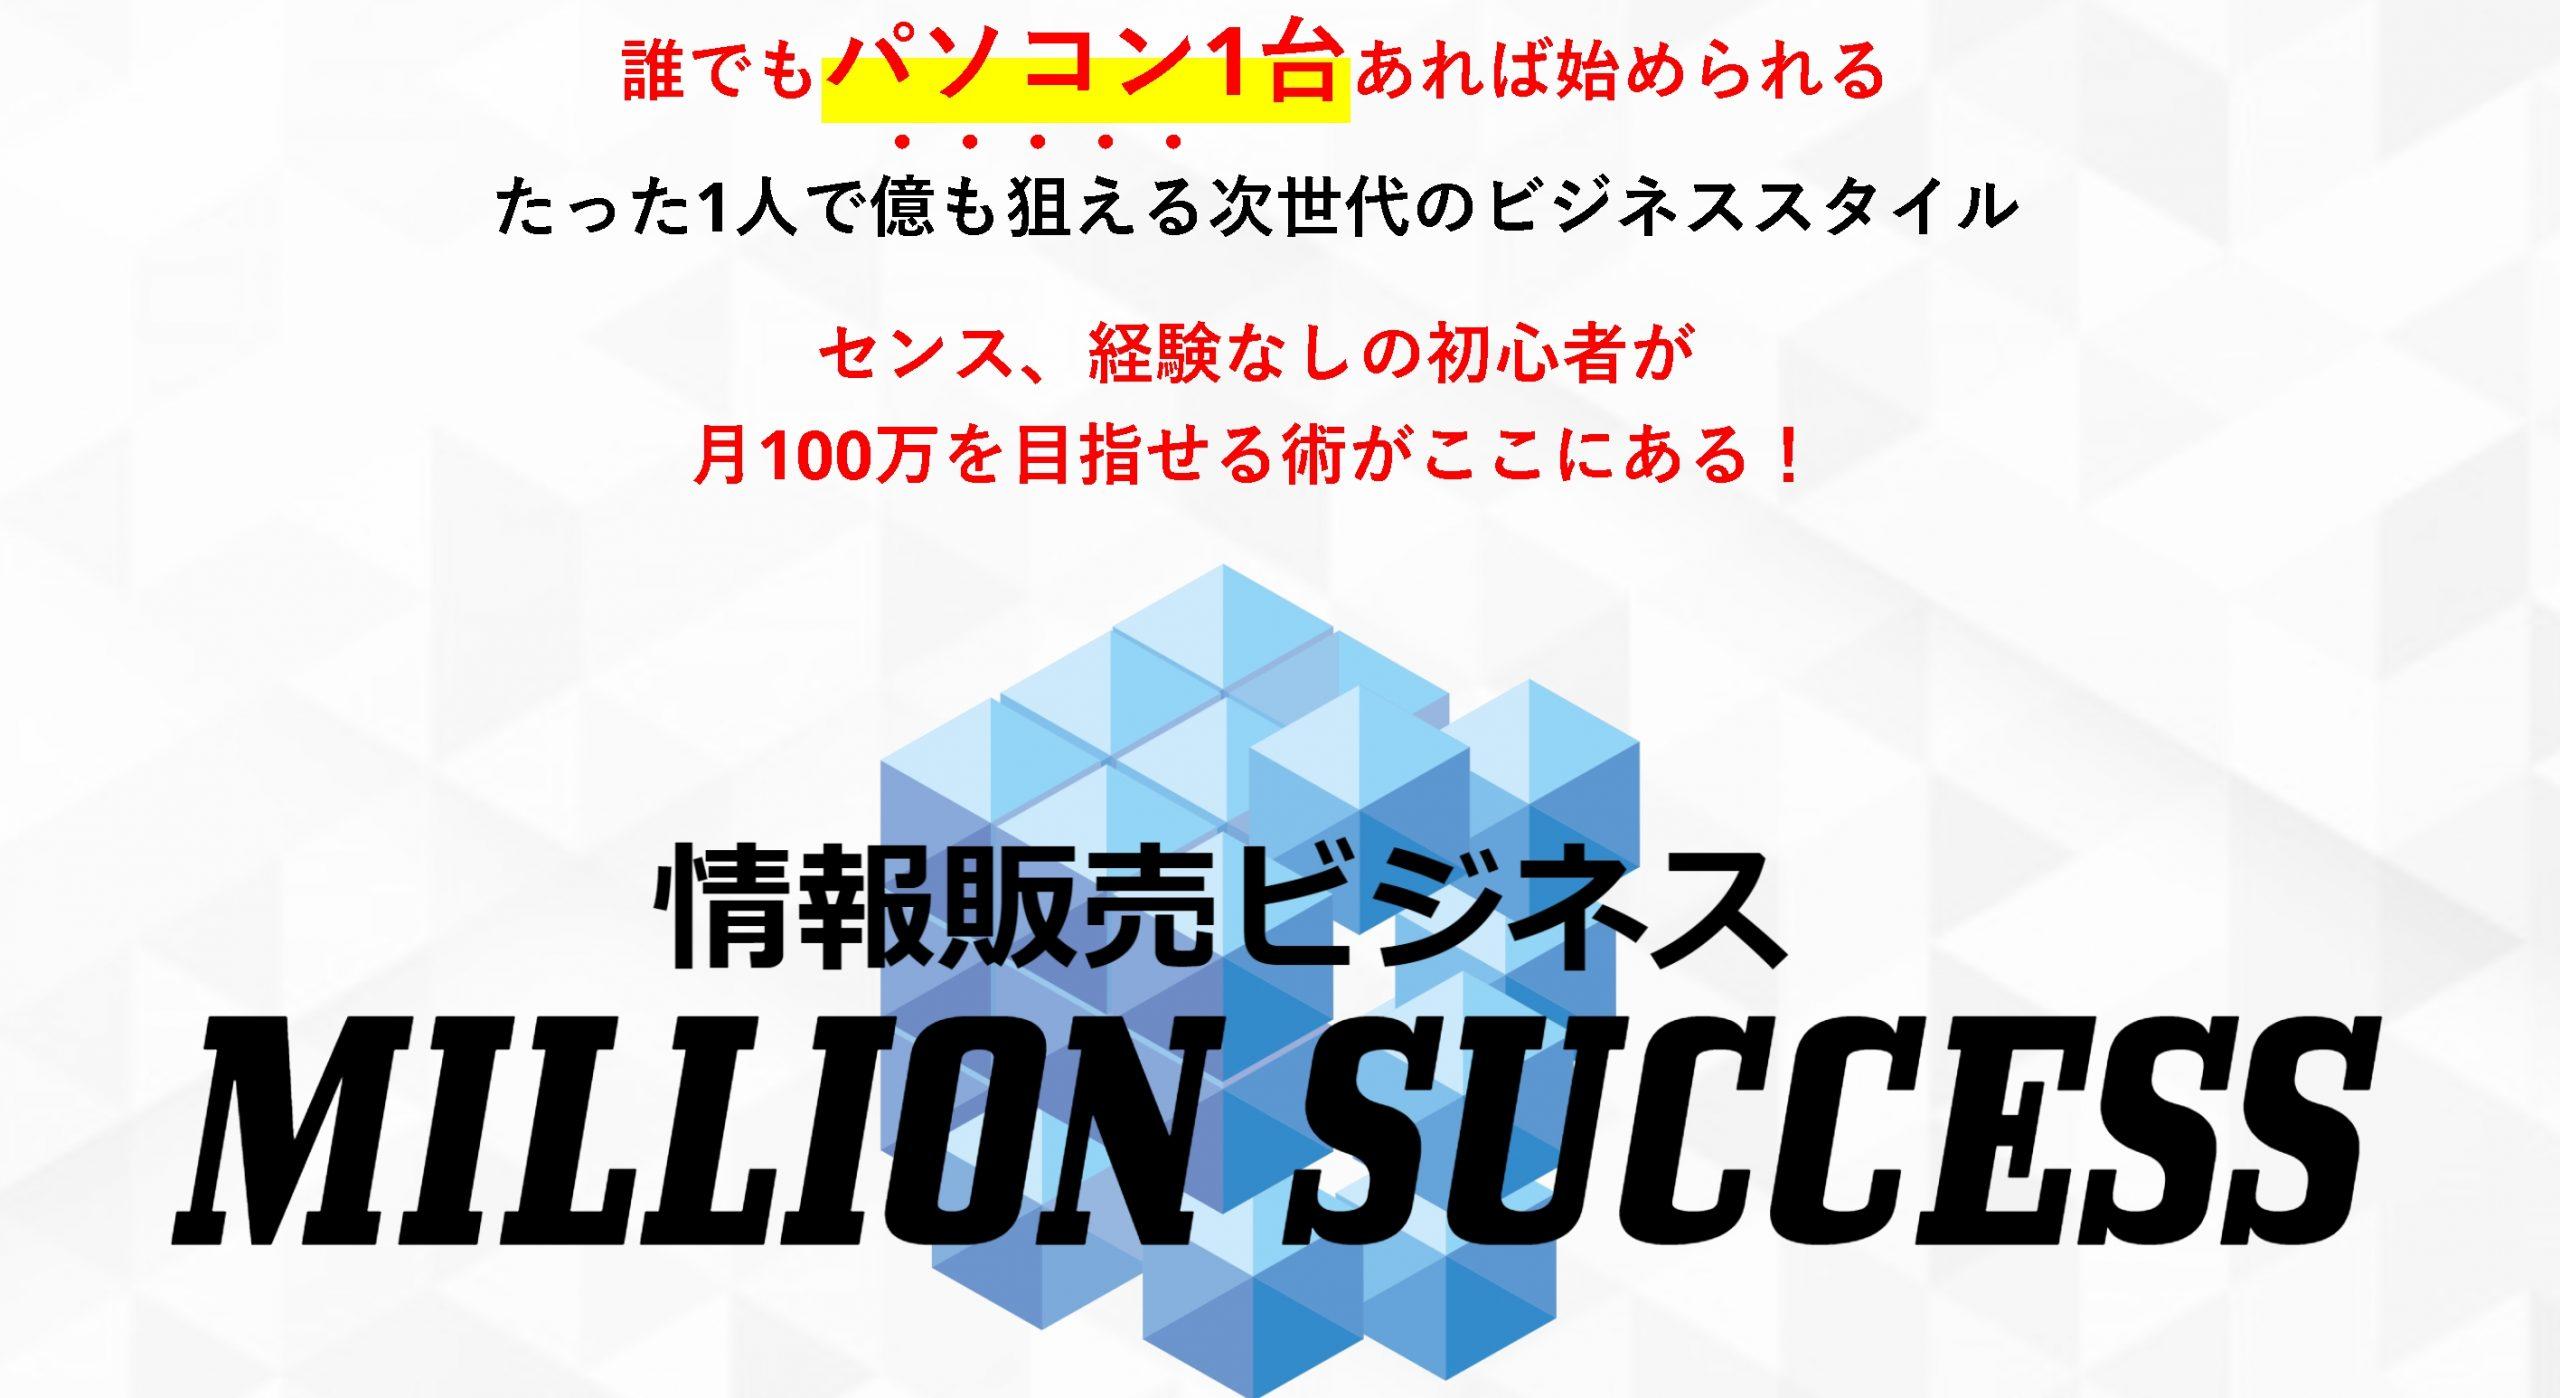 MILLION SUCCESS(吉岡廉/松岡将吾)の特典付きレビュー【情報販売ビジネスを完全攻略】